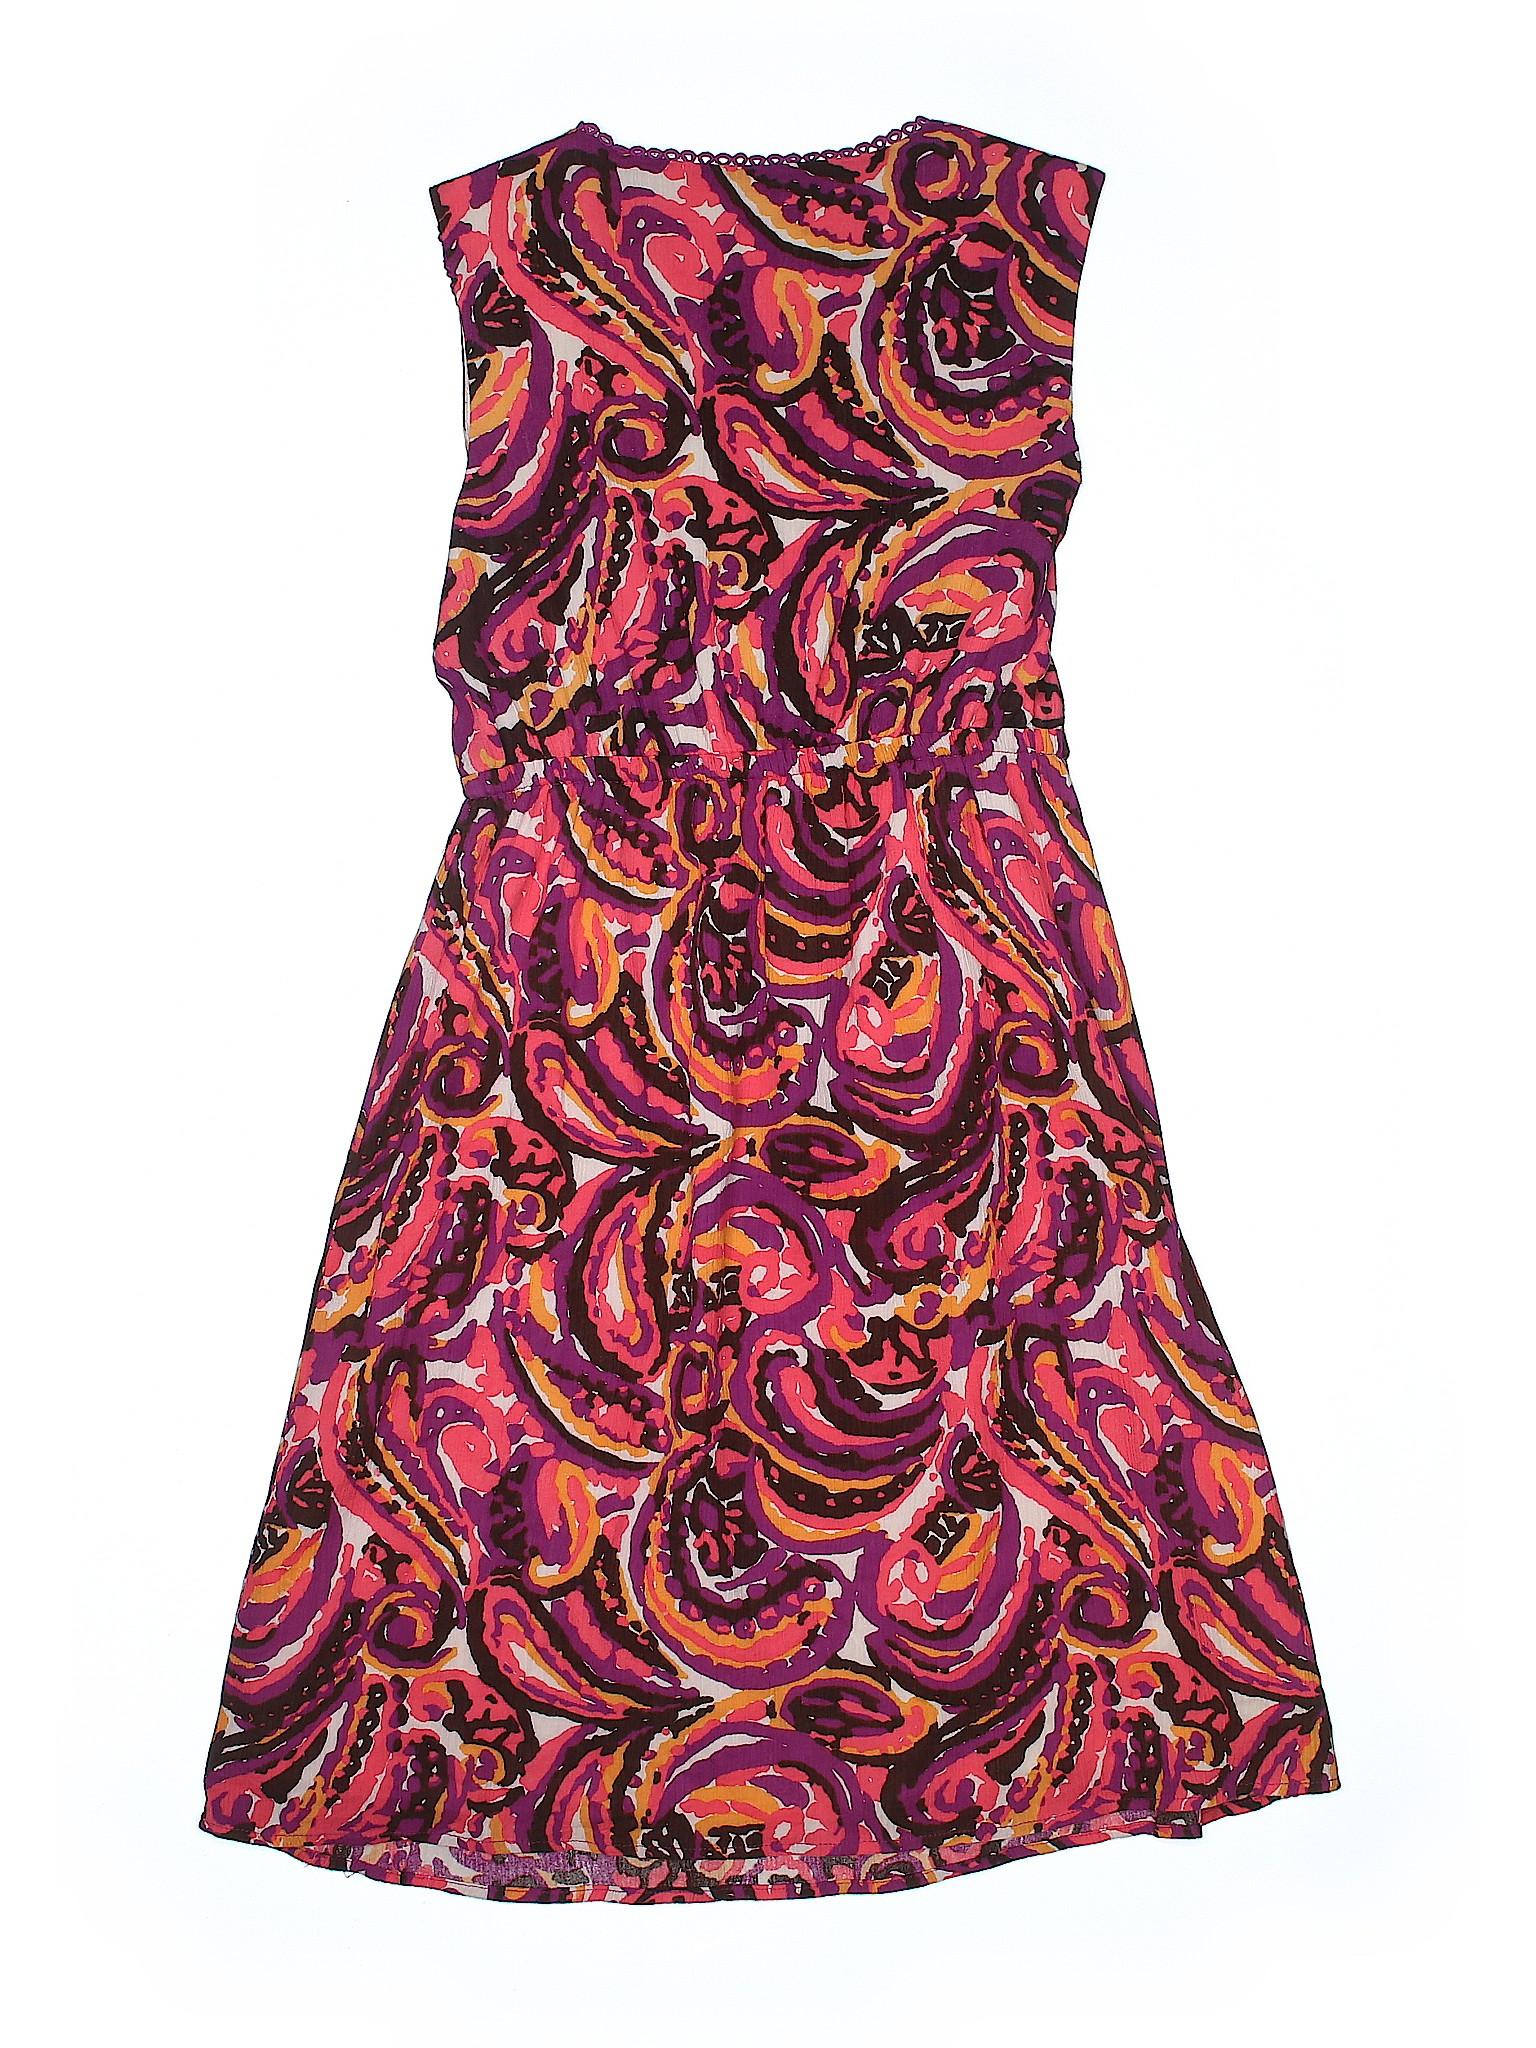 Selling Casual Selling Casual Selling Merona Dress Dress Merona Merona Casual 14xnHtqXw1